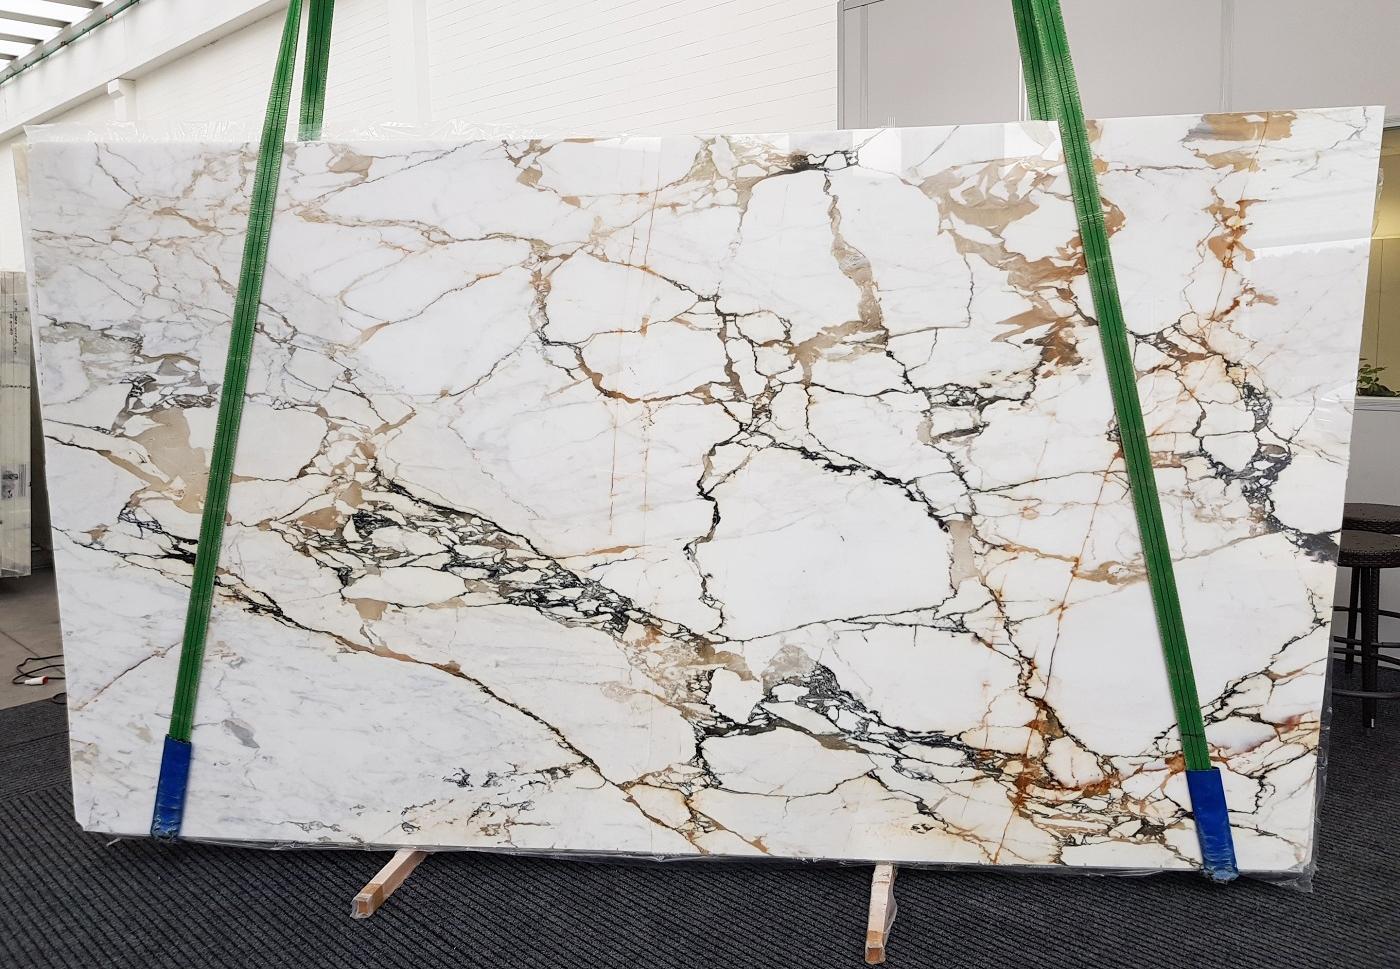 CALACATTA MACCHIAVECCHIA Suministro (Italia) de planchas pulidas en mármol natural GL 1131 , Bundle #8